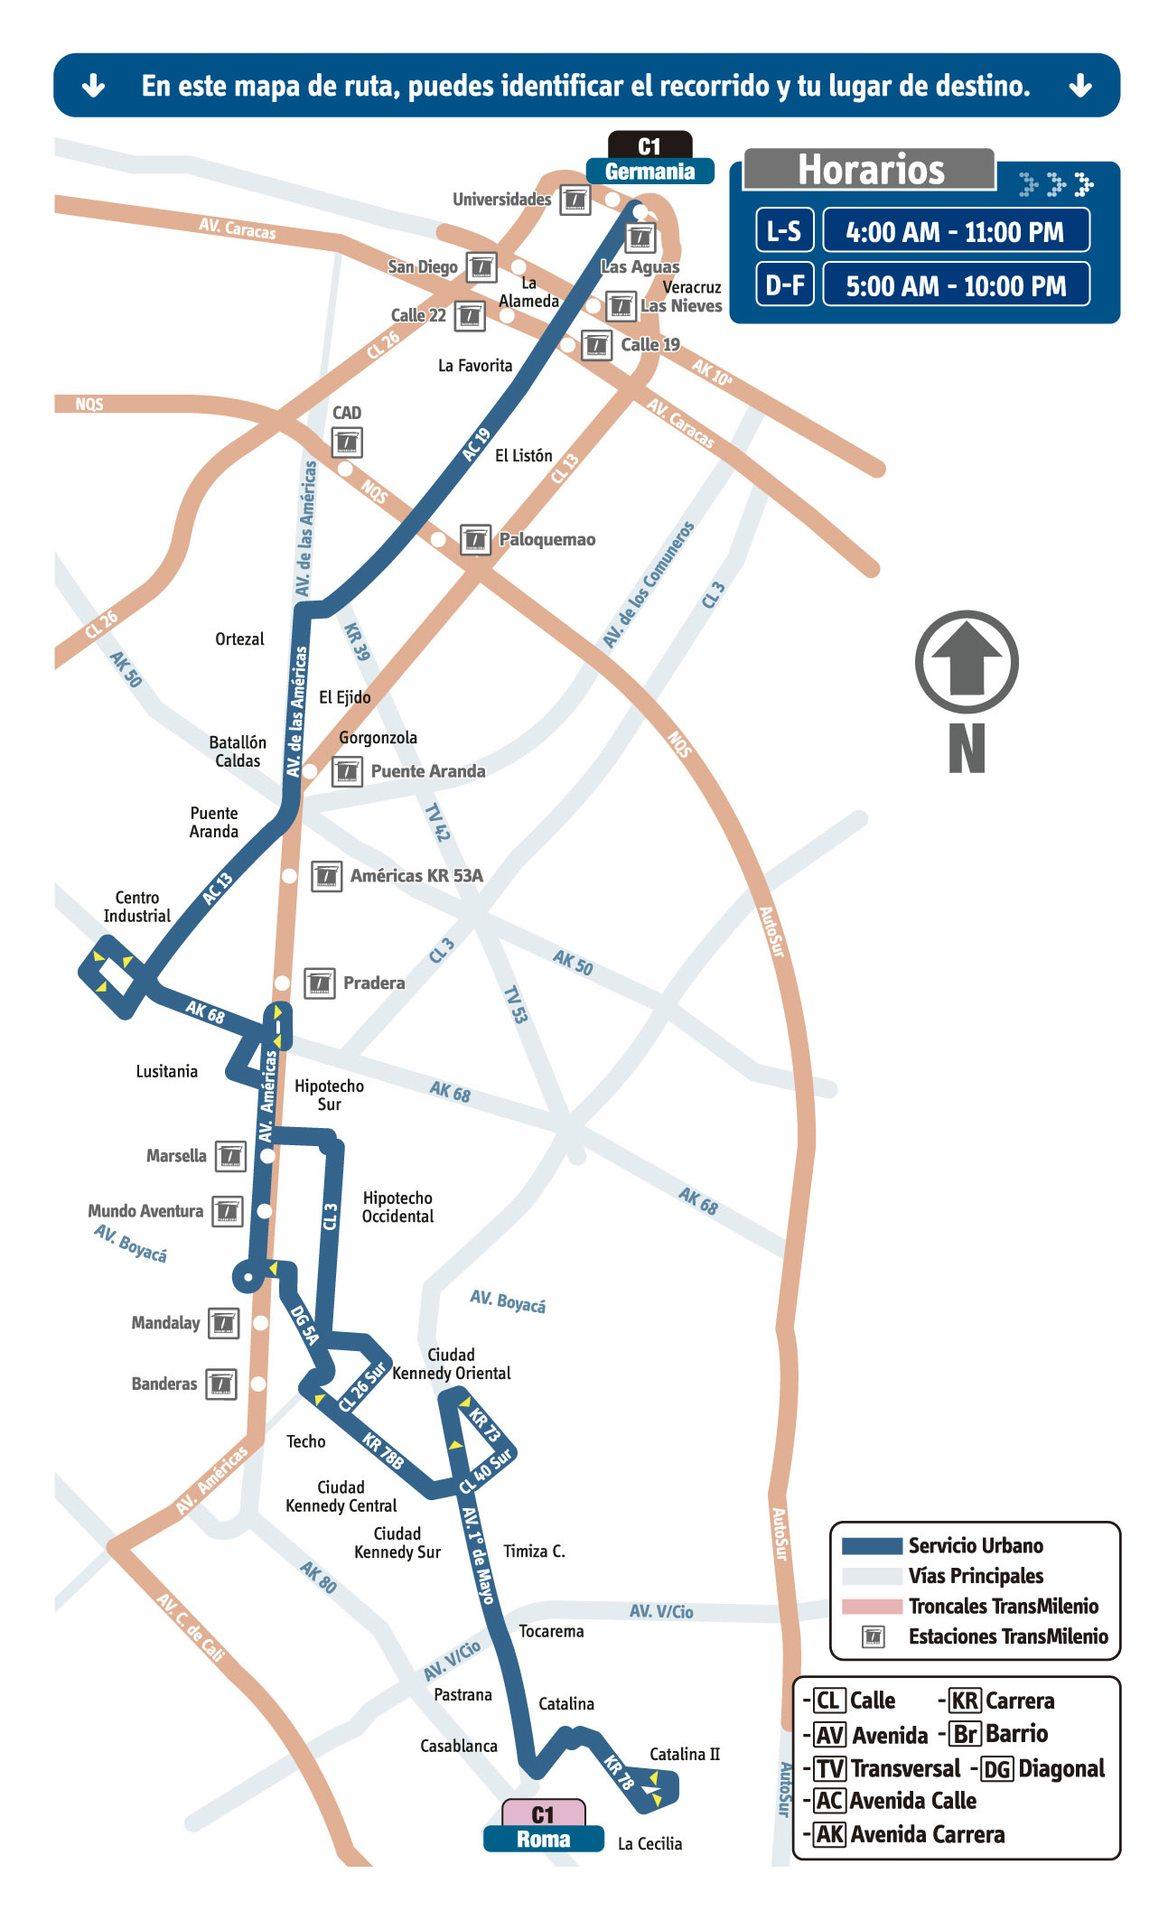 Ruta SITP: C1 Roma ↔ Germania [Urbana] 2